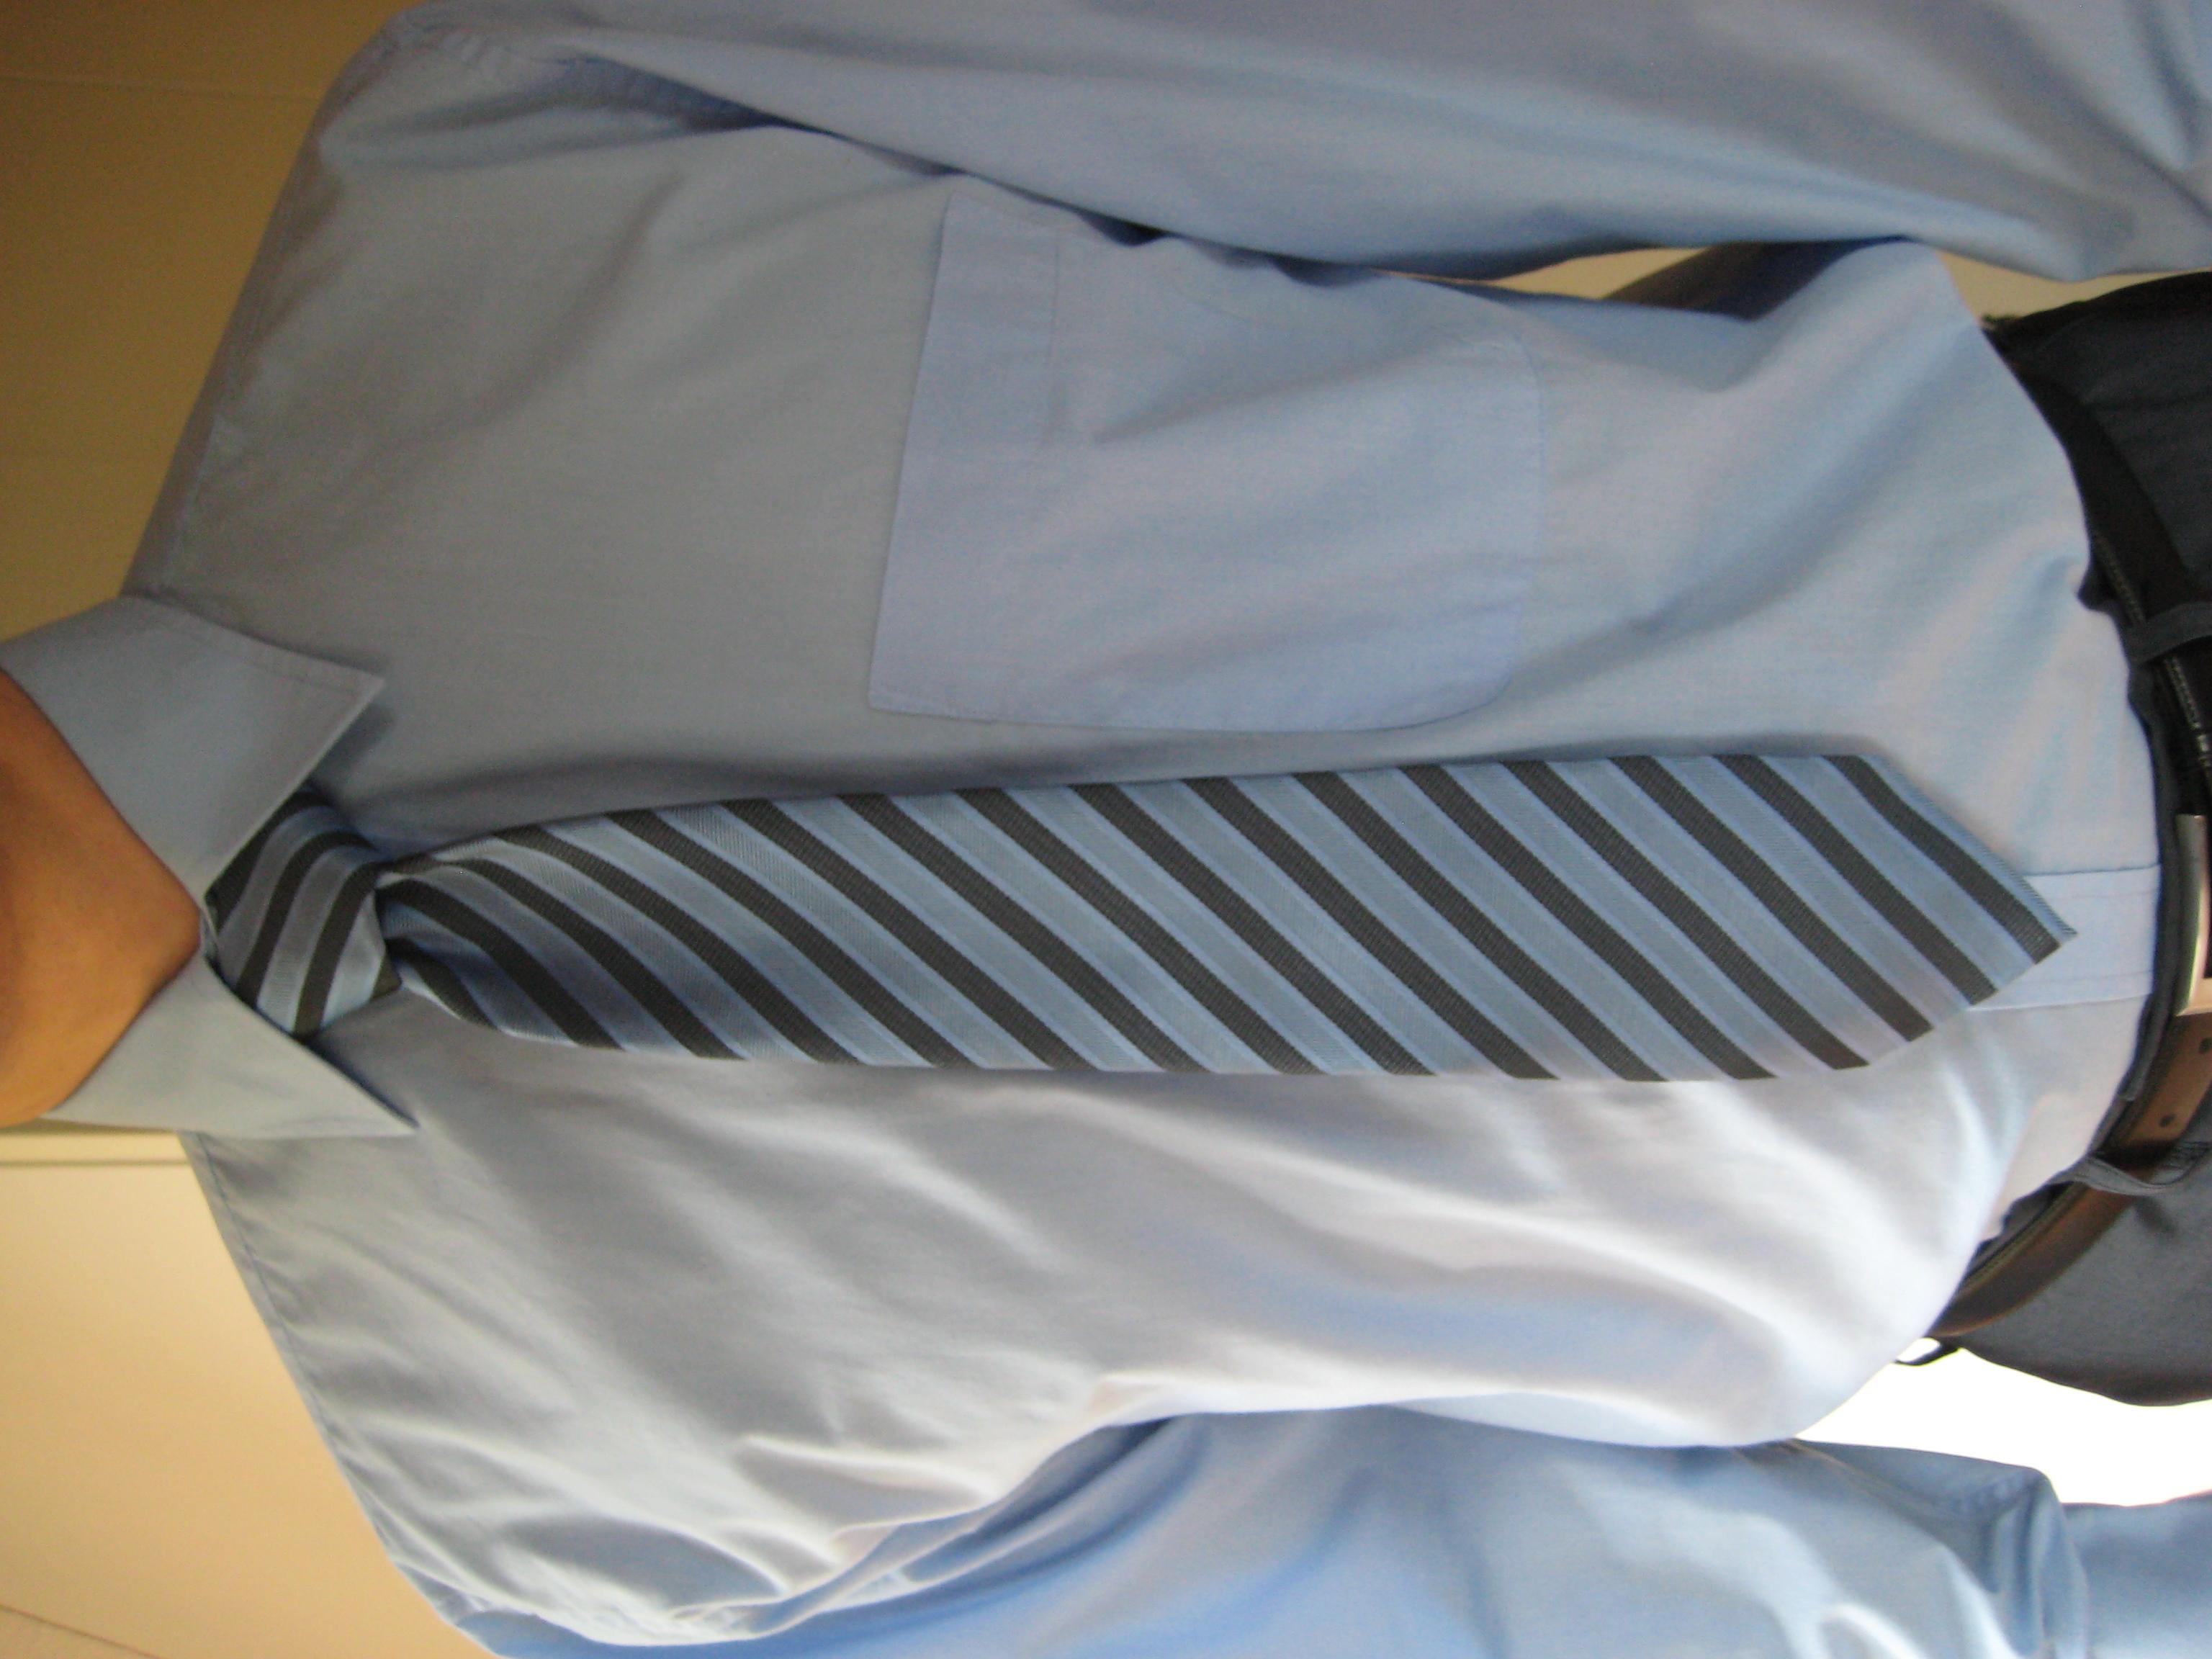 Krawattenlänge zu kurz